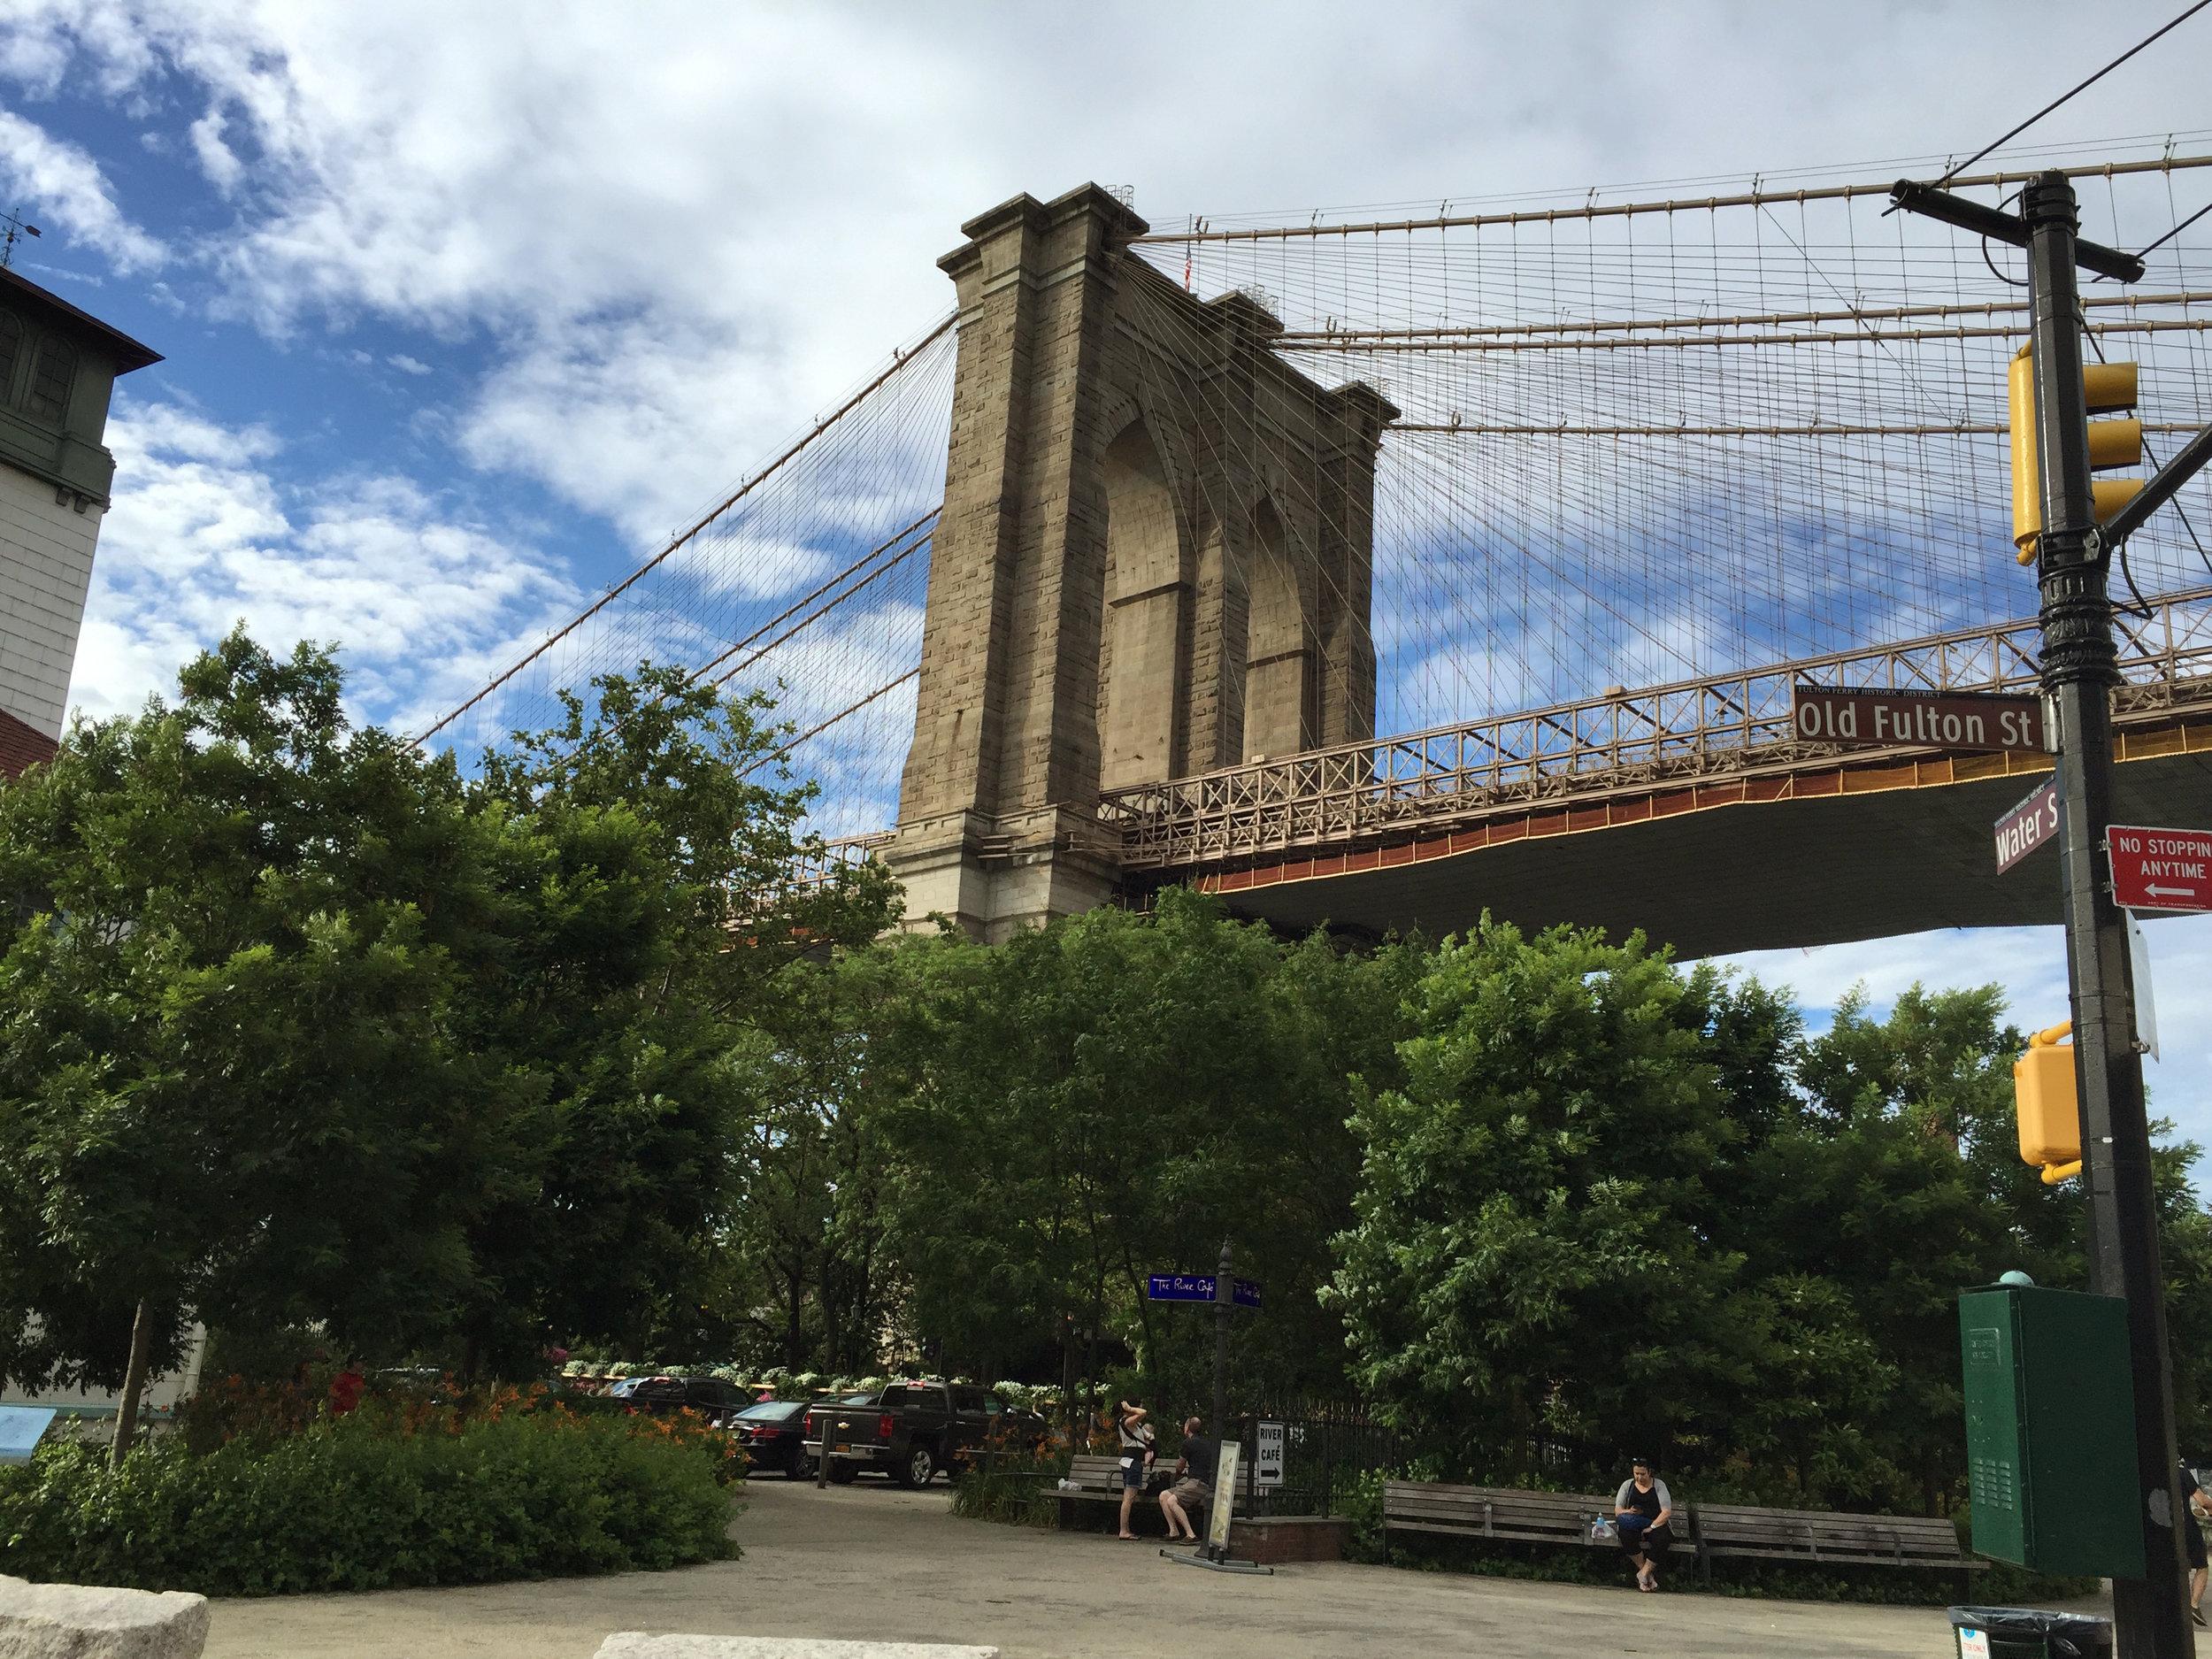 Brooklyn-Bridge_Old_Fulton-Rd_Allyn_Howard.jpg